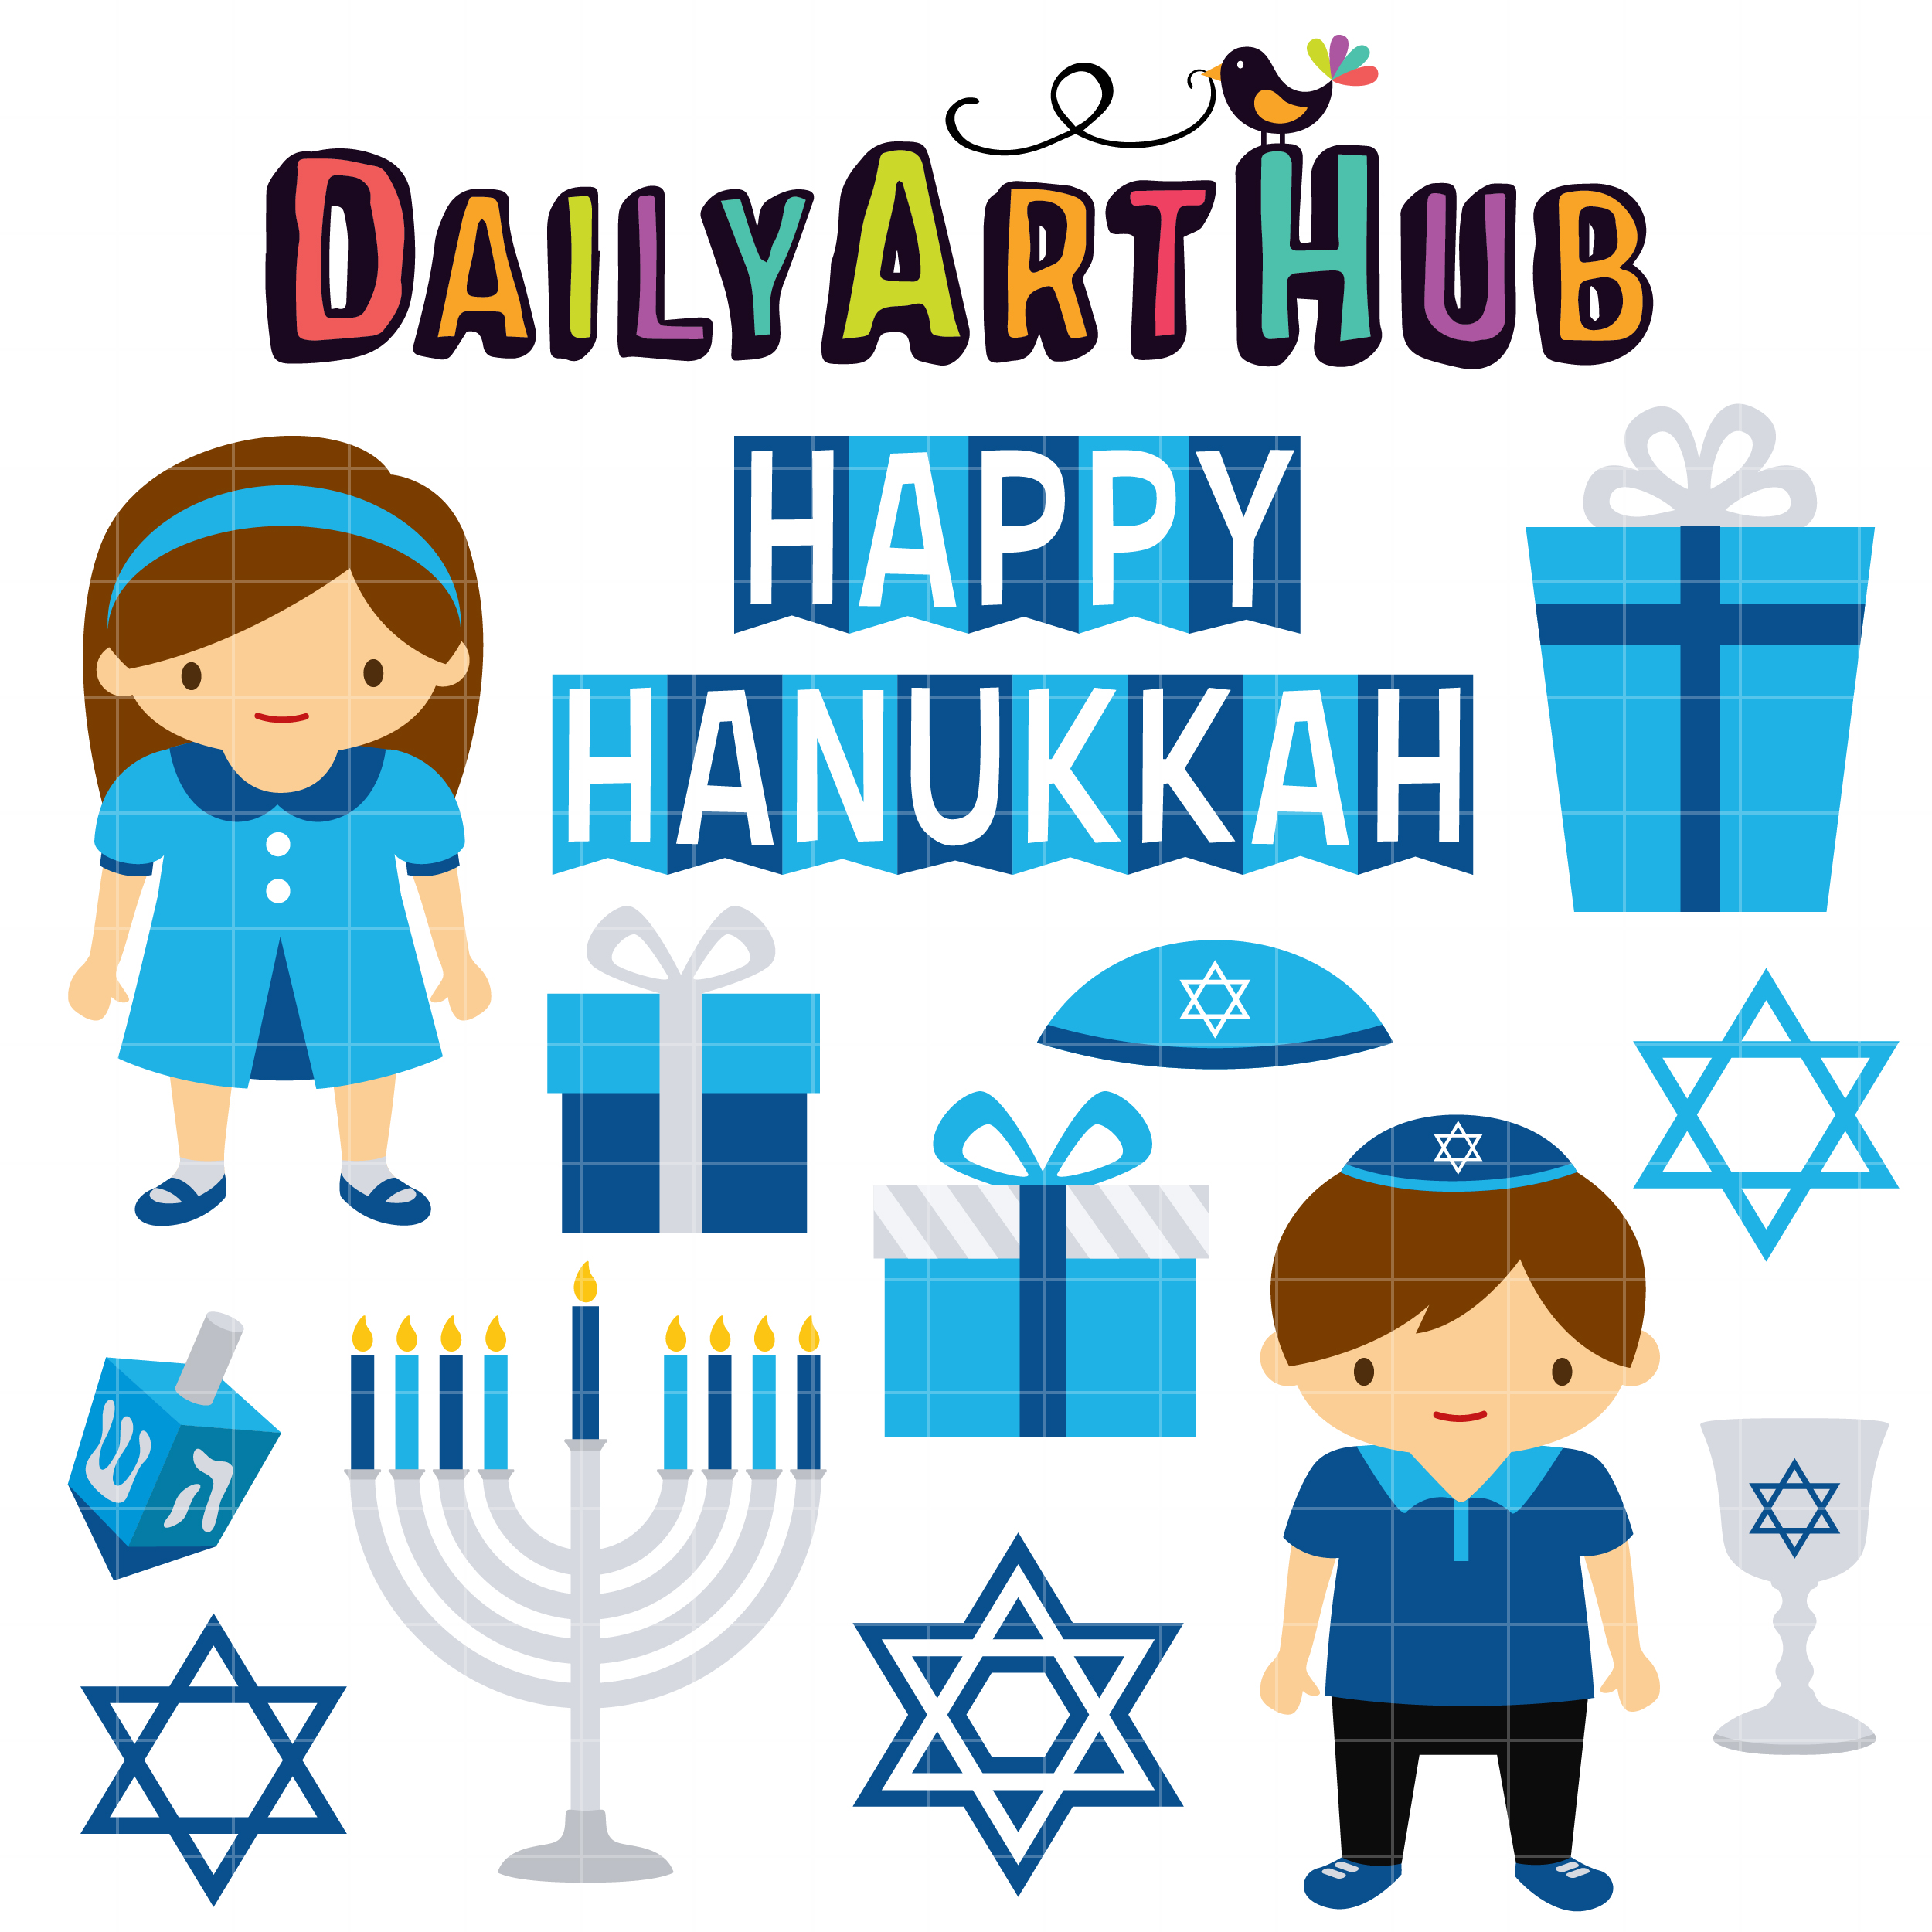 happy hanukkah clip art set daily art hub free clip art everyday rh dailyarthub com christmas hanukkah clip art christmas hanukkah clip art